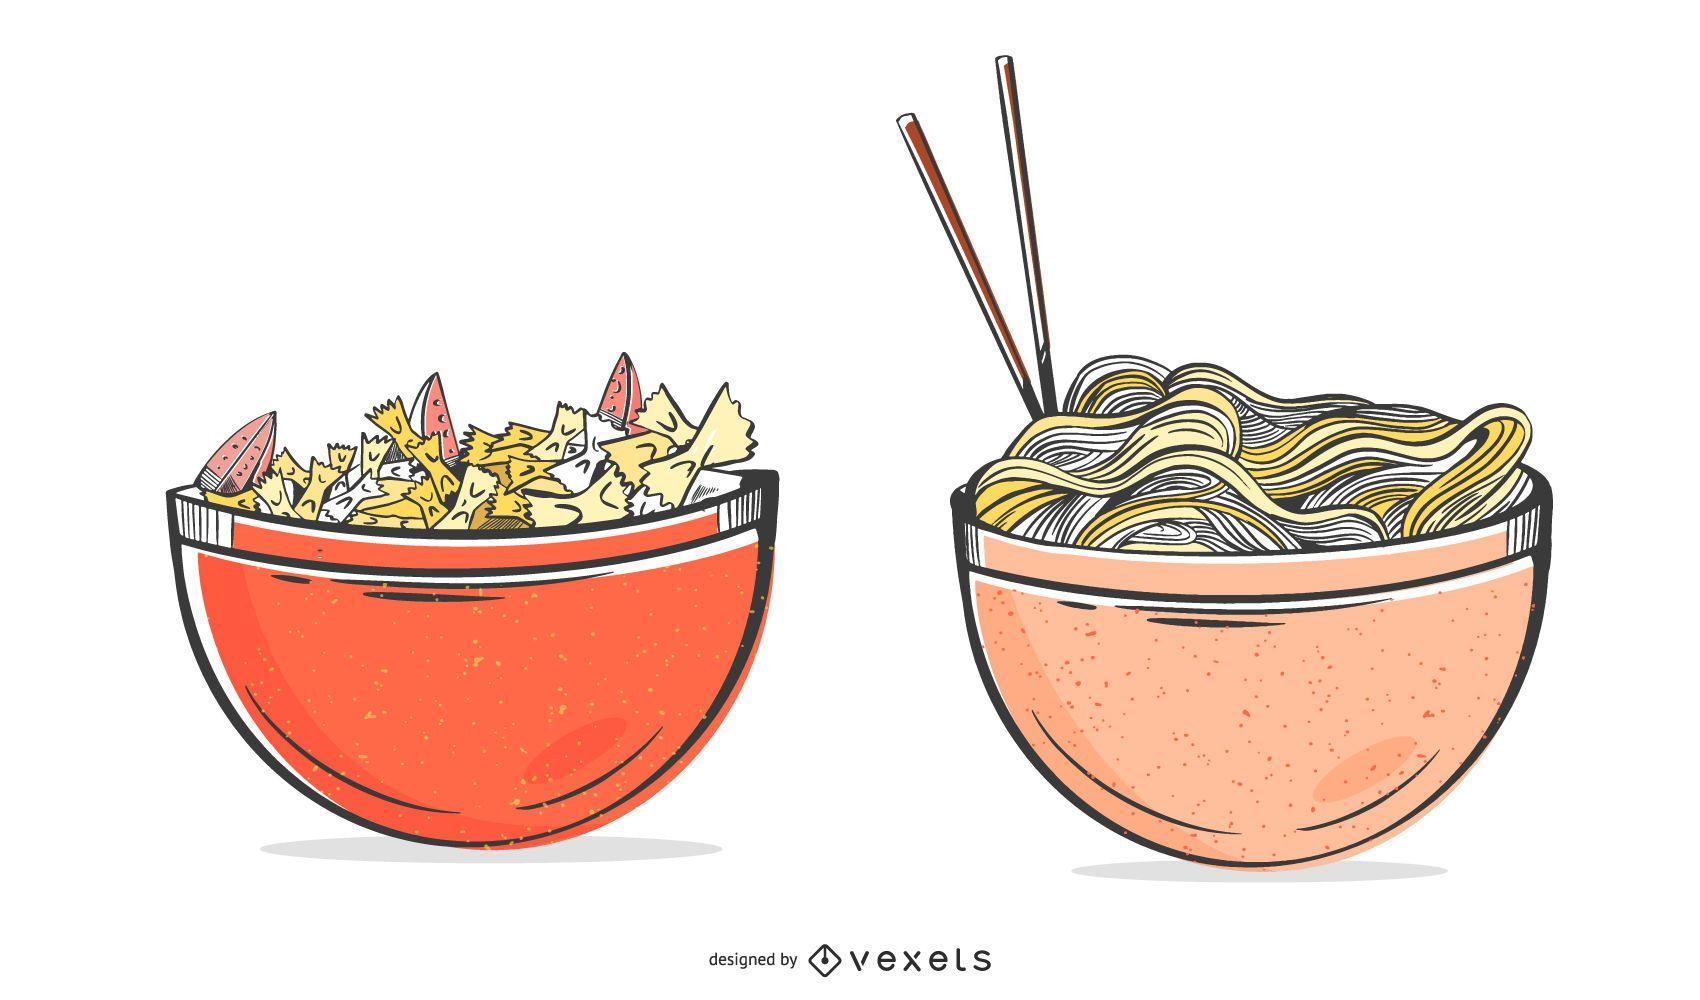 Pasta bowls illustration set